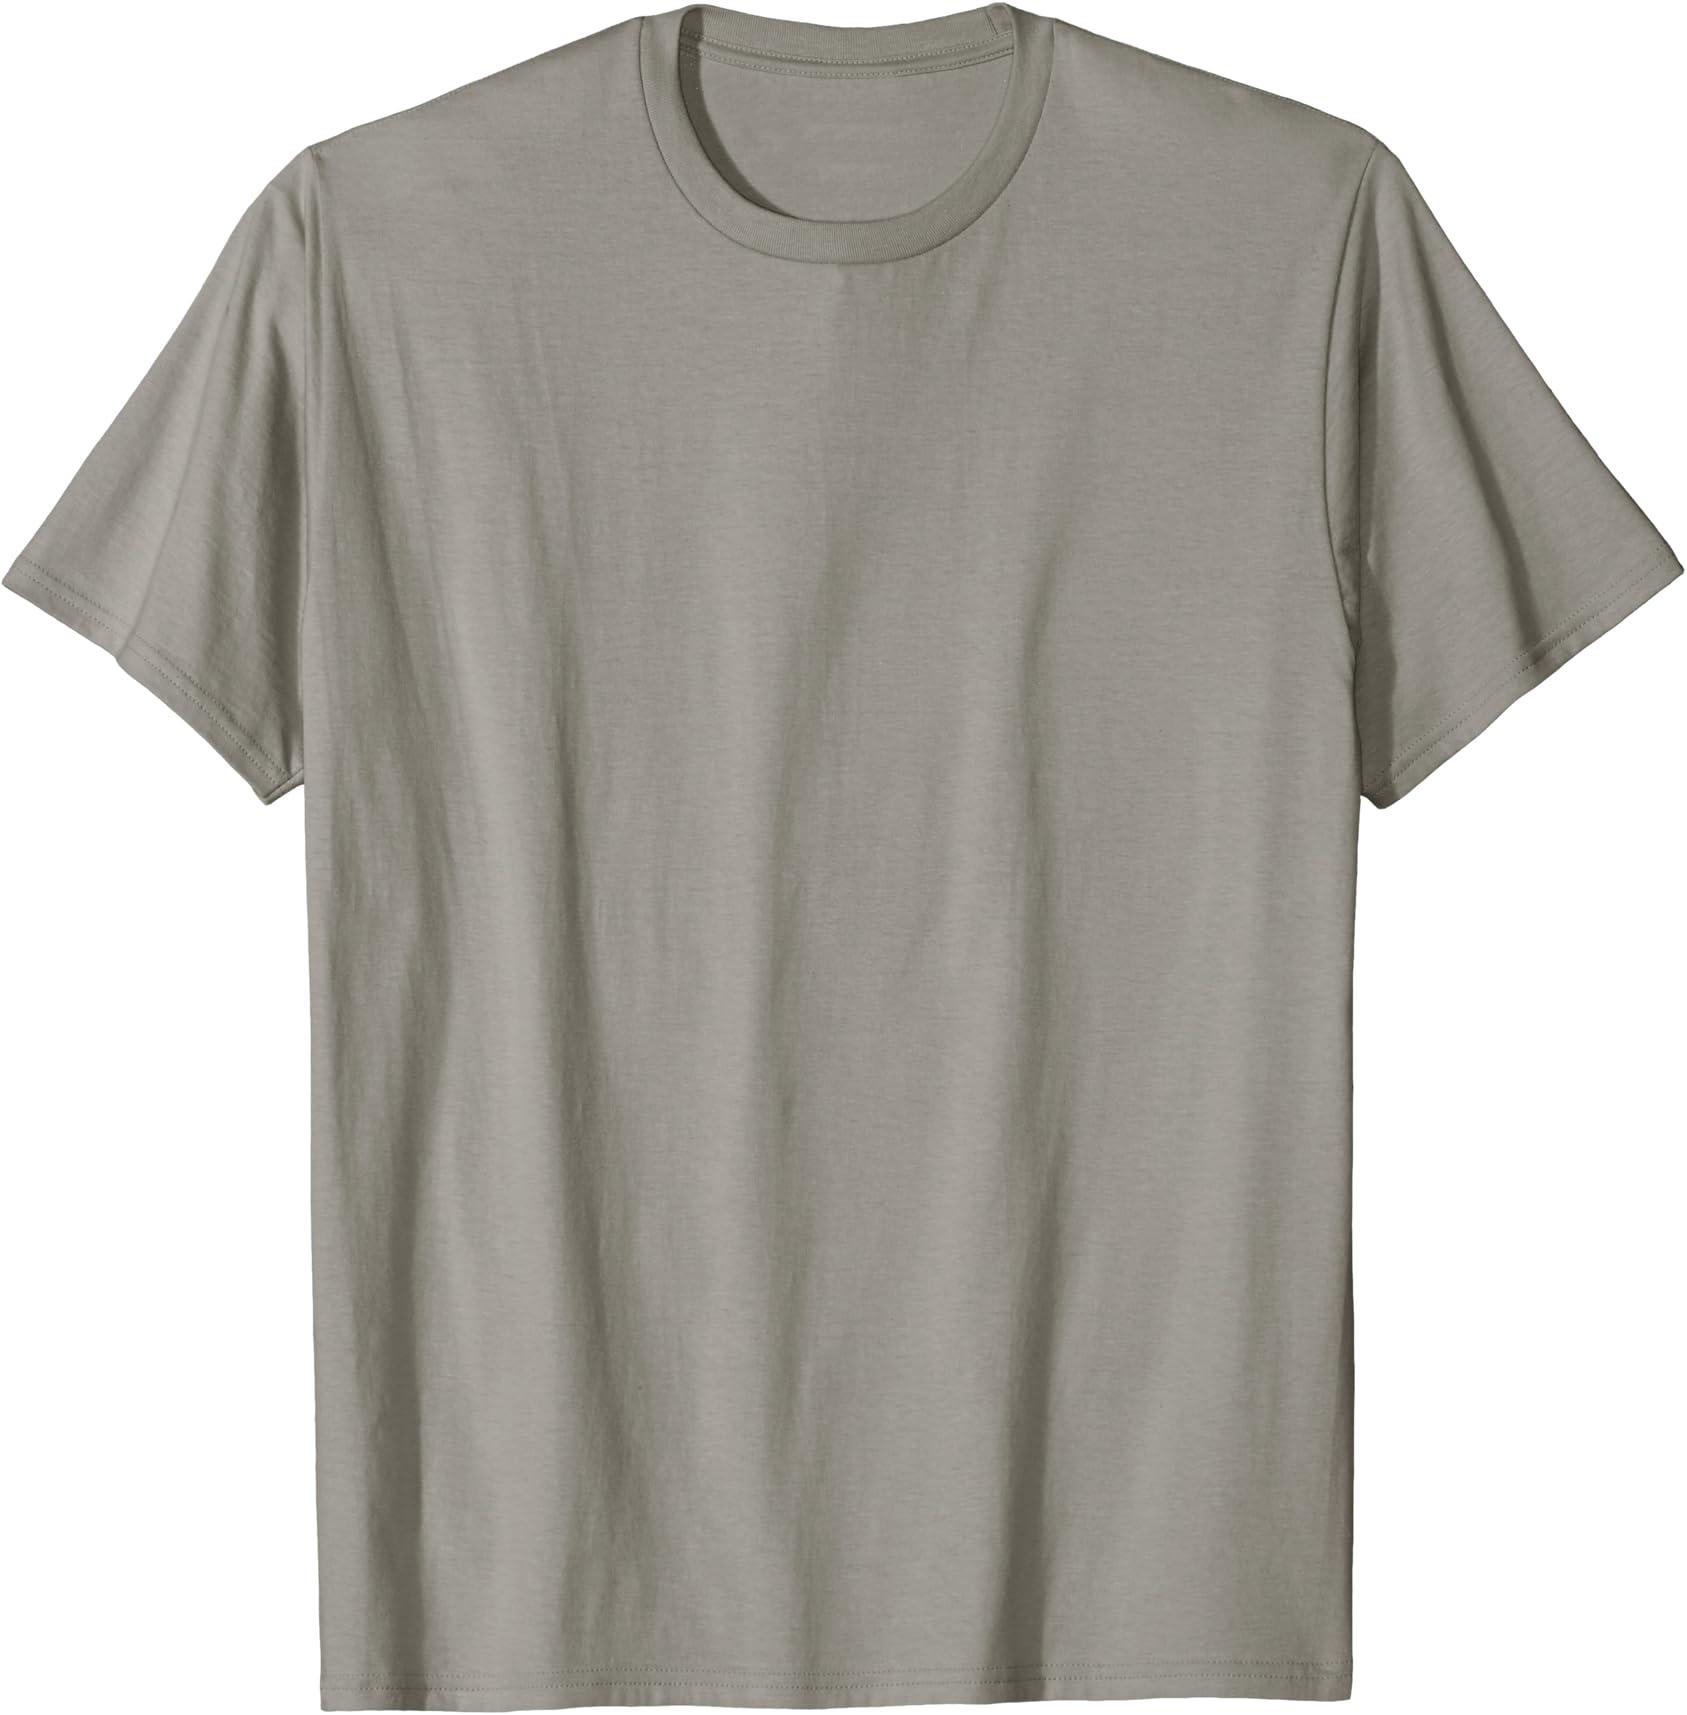 New Grand Canyon National Park Youth sizes M-L Gildan Shirt